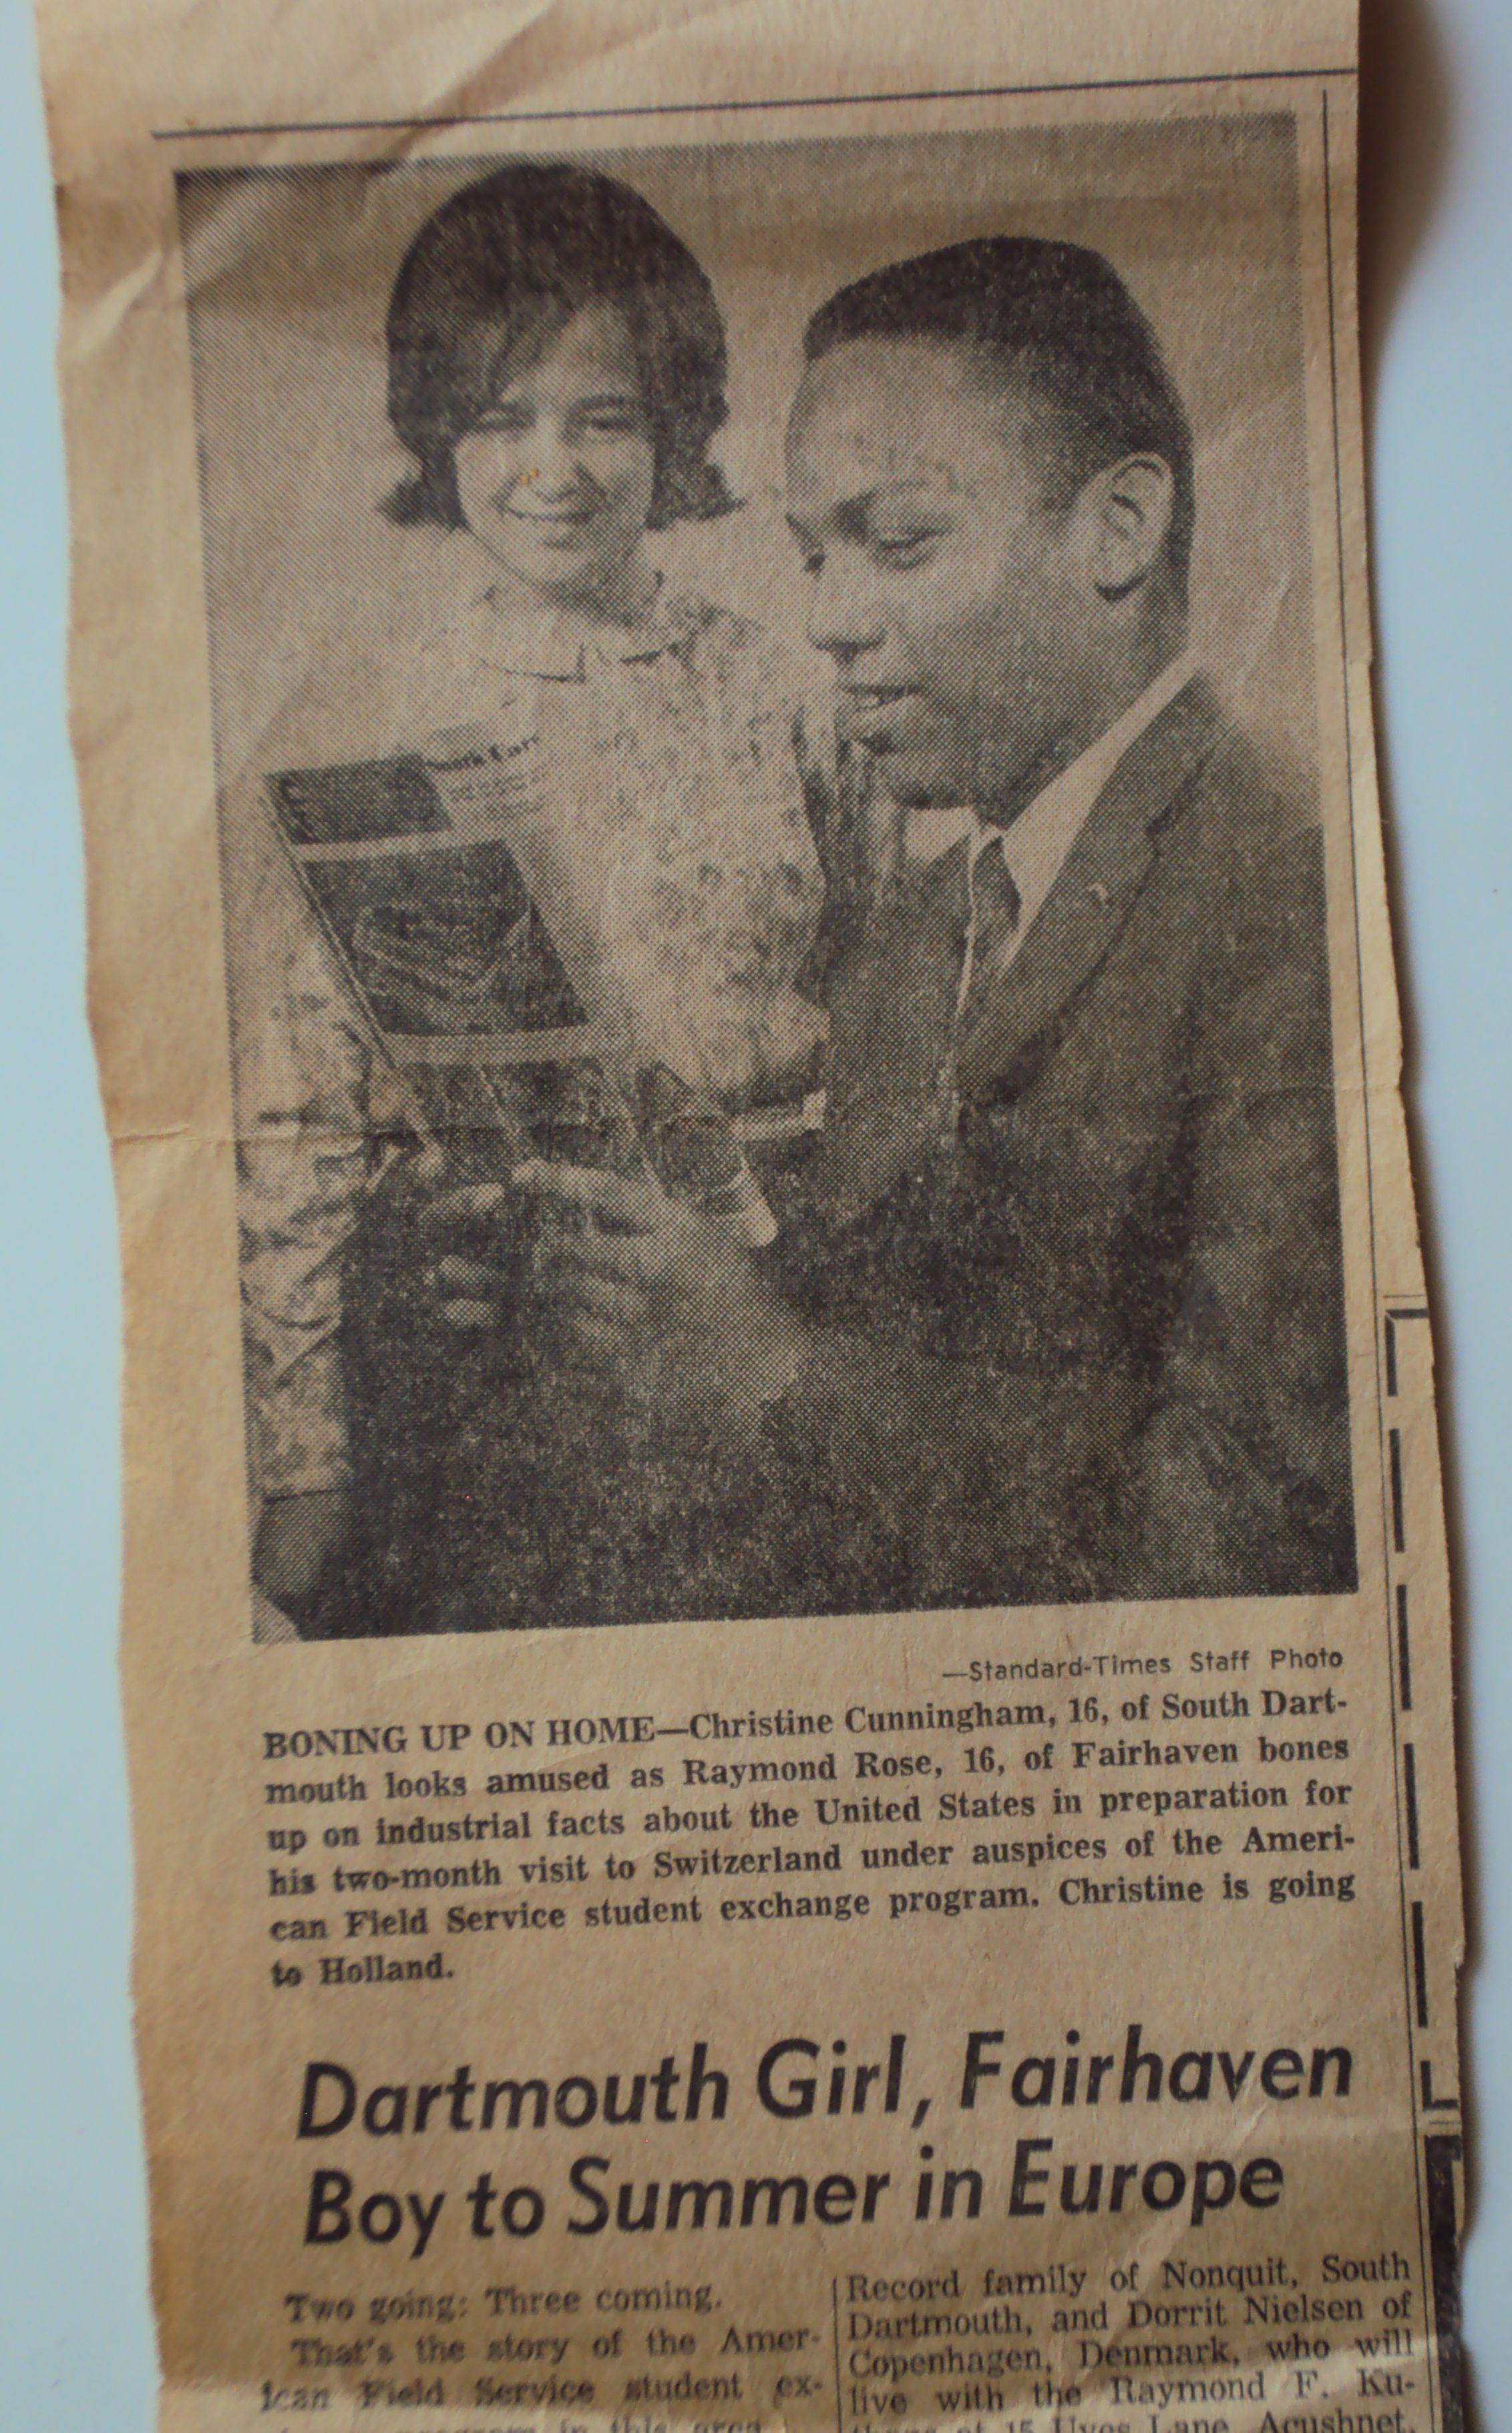 American Field Service Student Exchange Program.  1960s.  South Dartmouth, Massachusetts, Christine Cunningham.